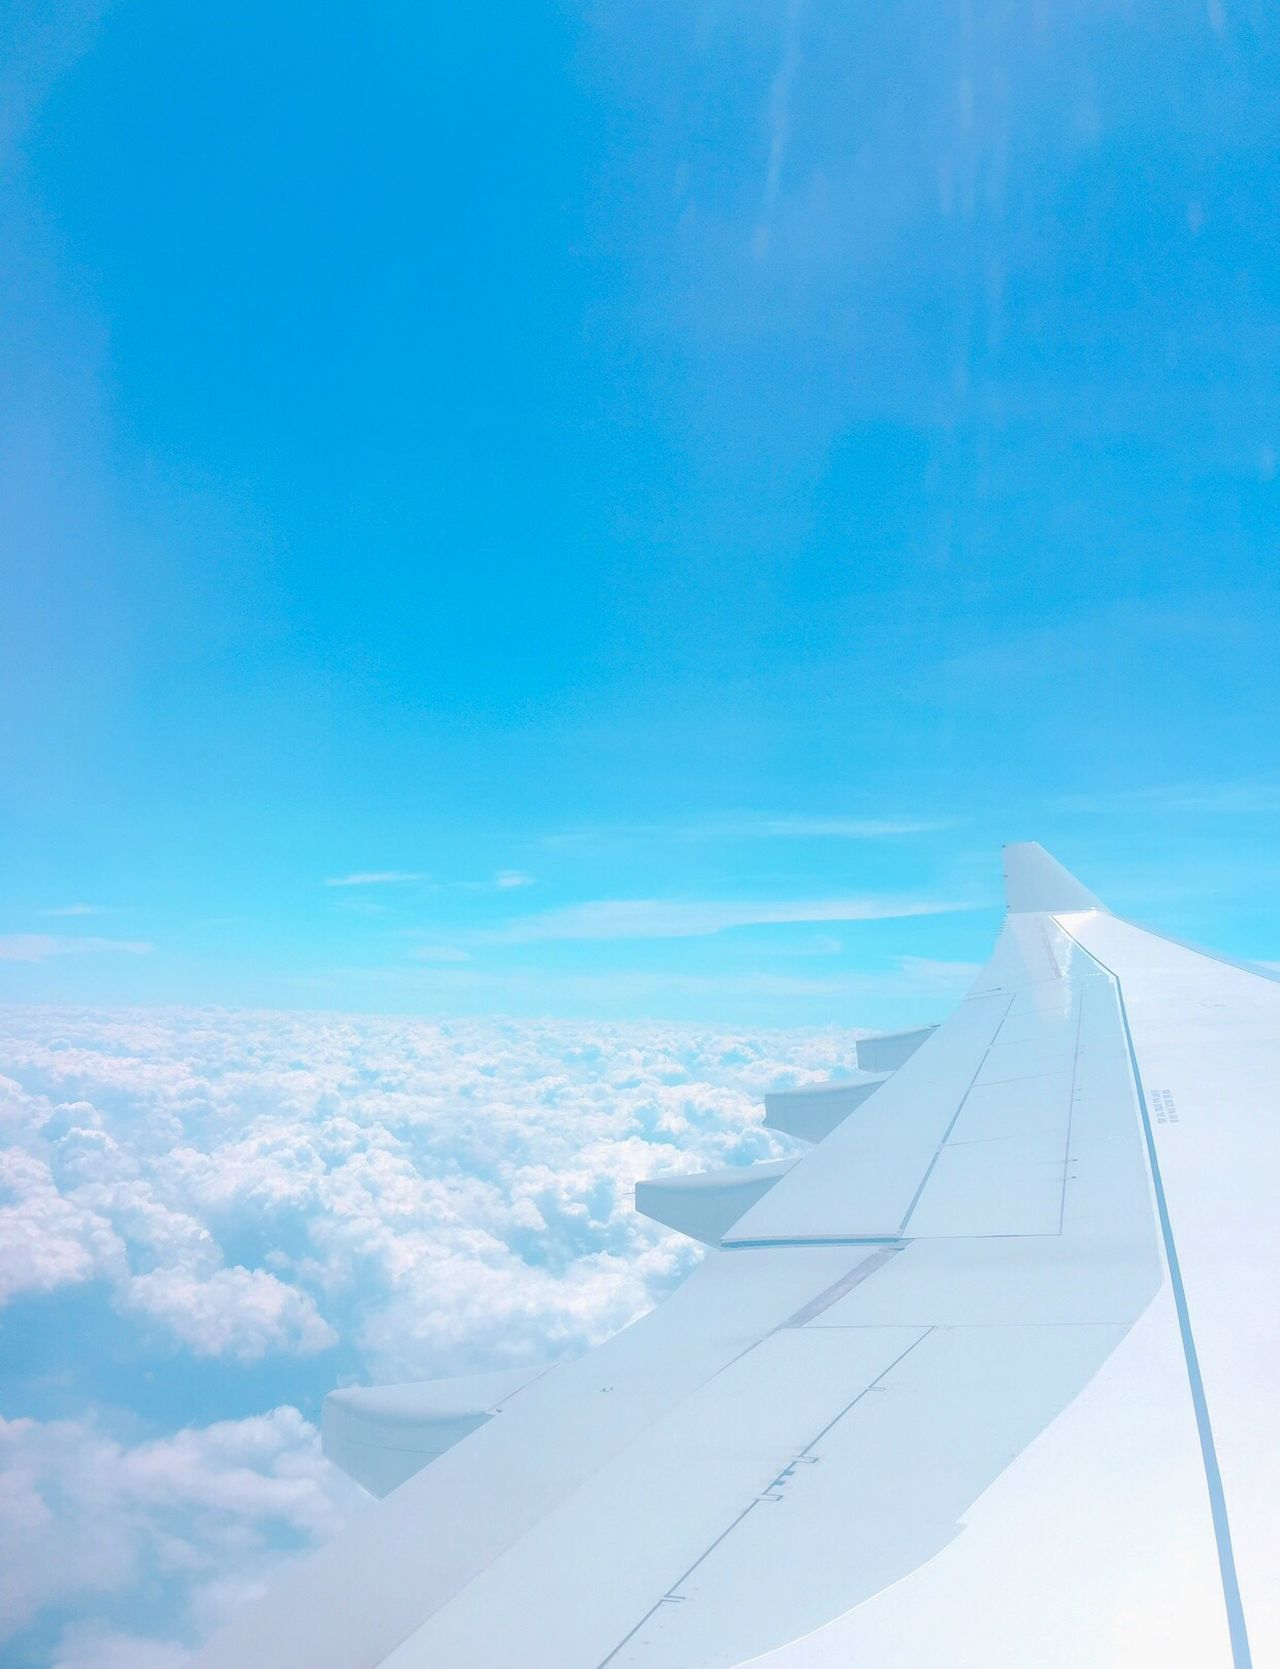 Sky Sky And Clouds Airplane Cloud Y00NJI